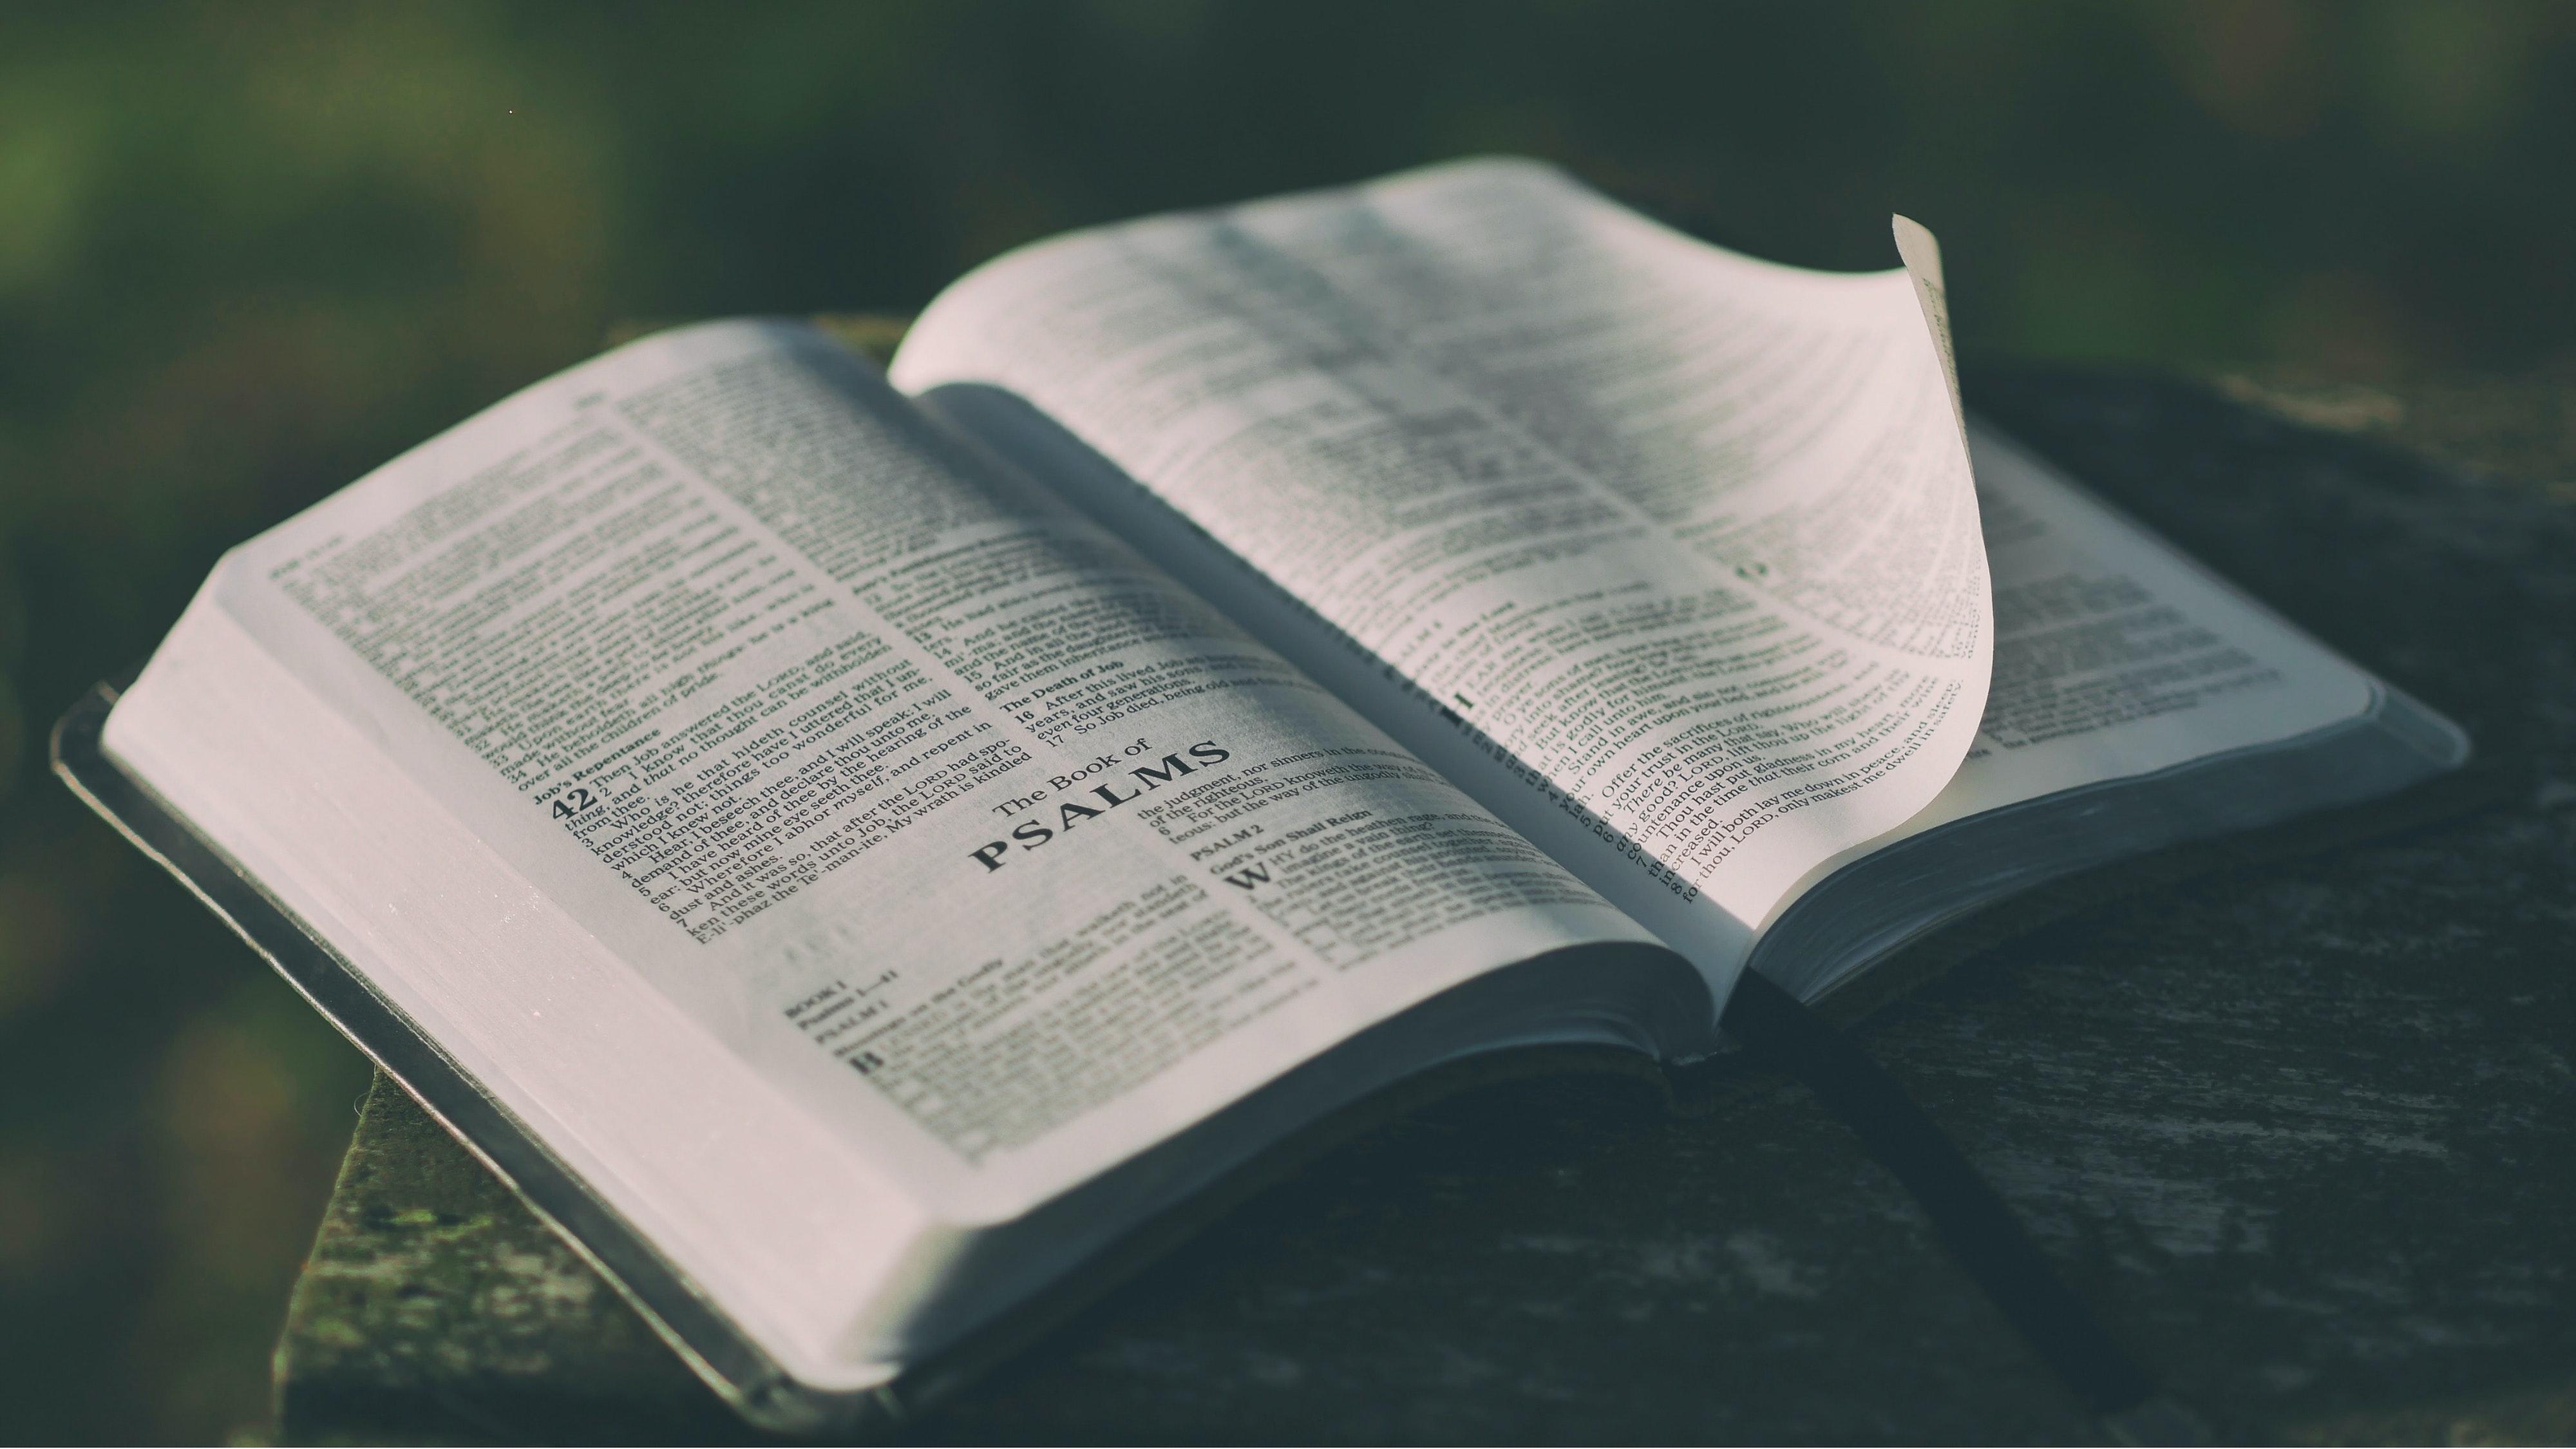 CHRISTIAN WAY OF LIFE Applying Gods Word More Fully (May 2013)